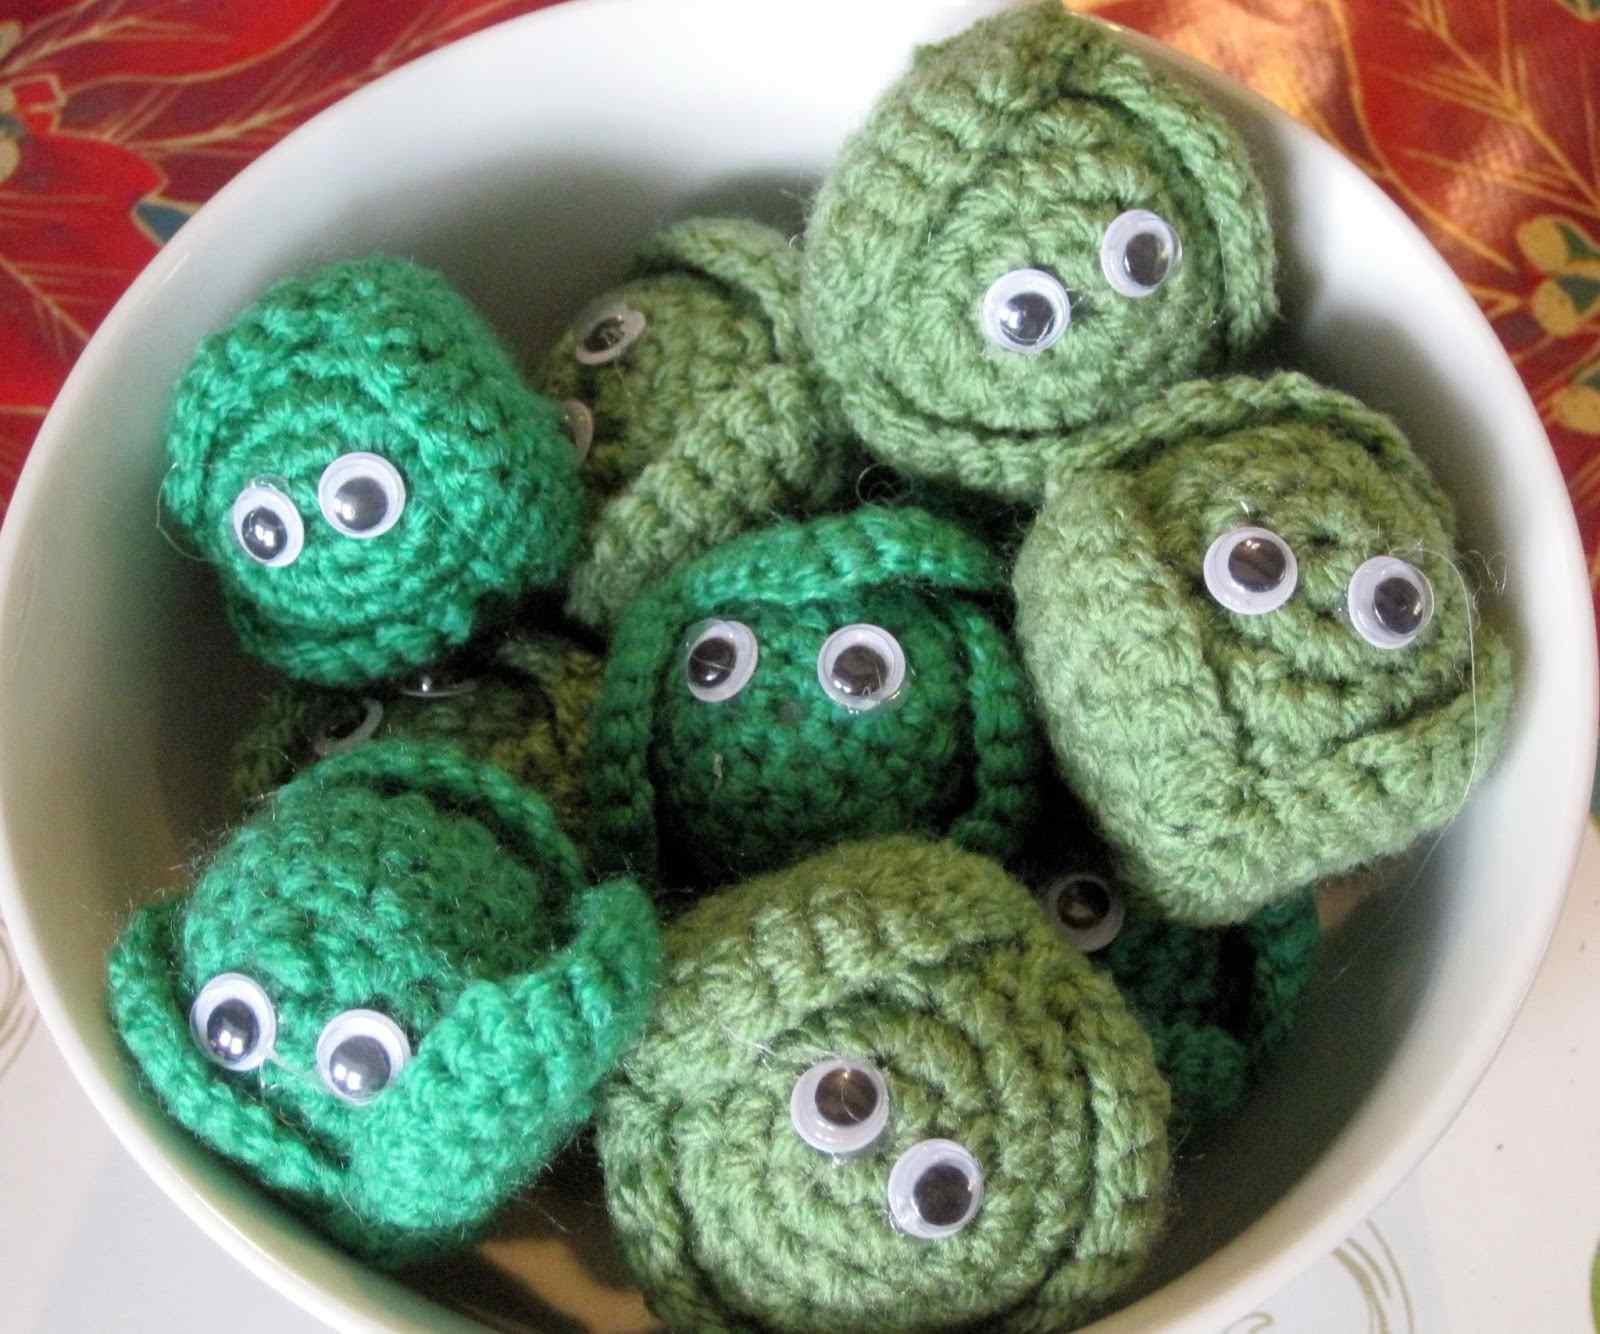 25 Fruit And Vegetable Crochet Patterns